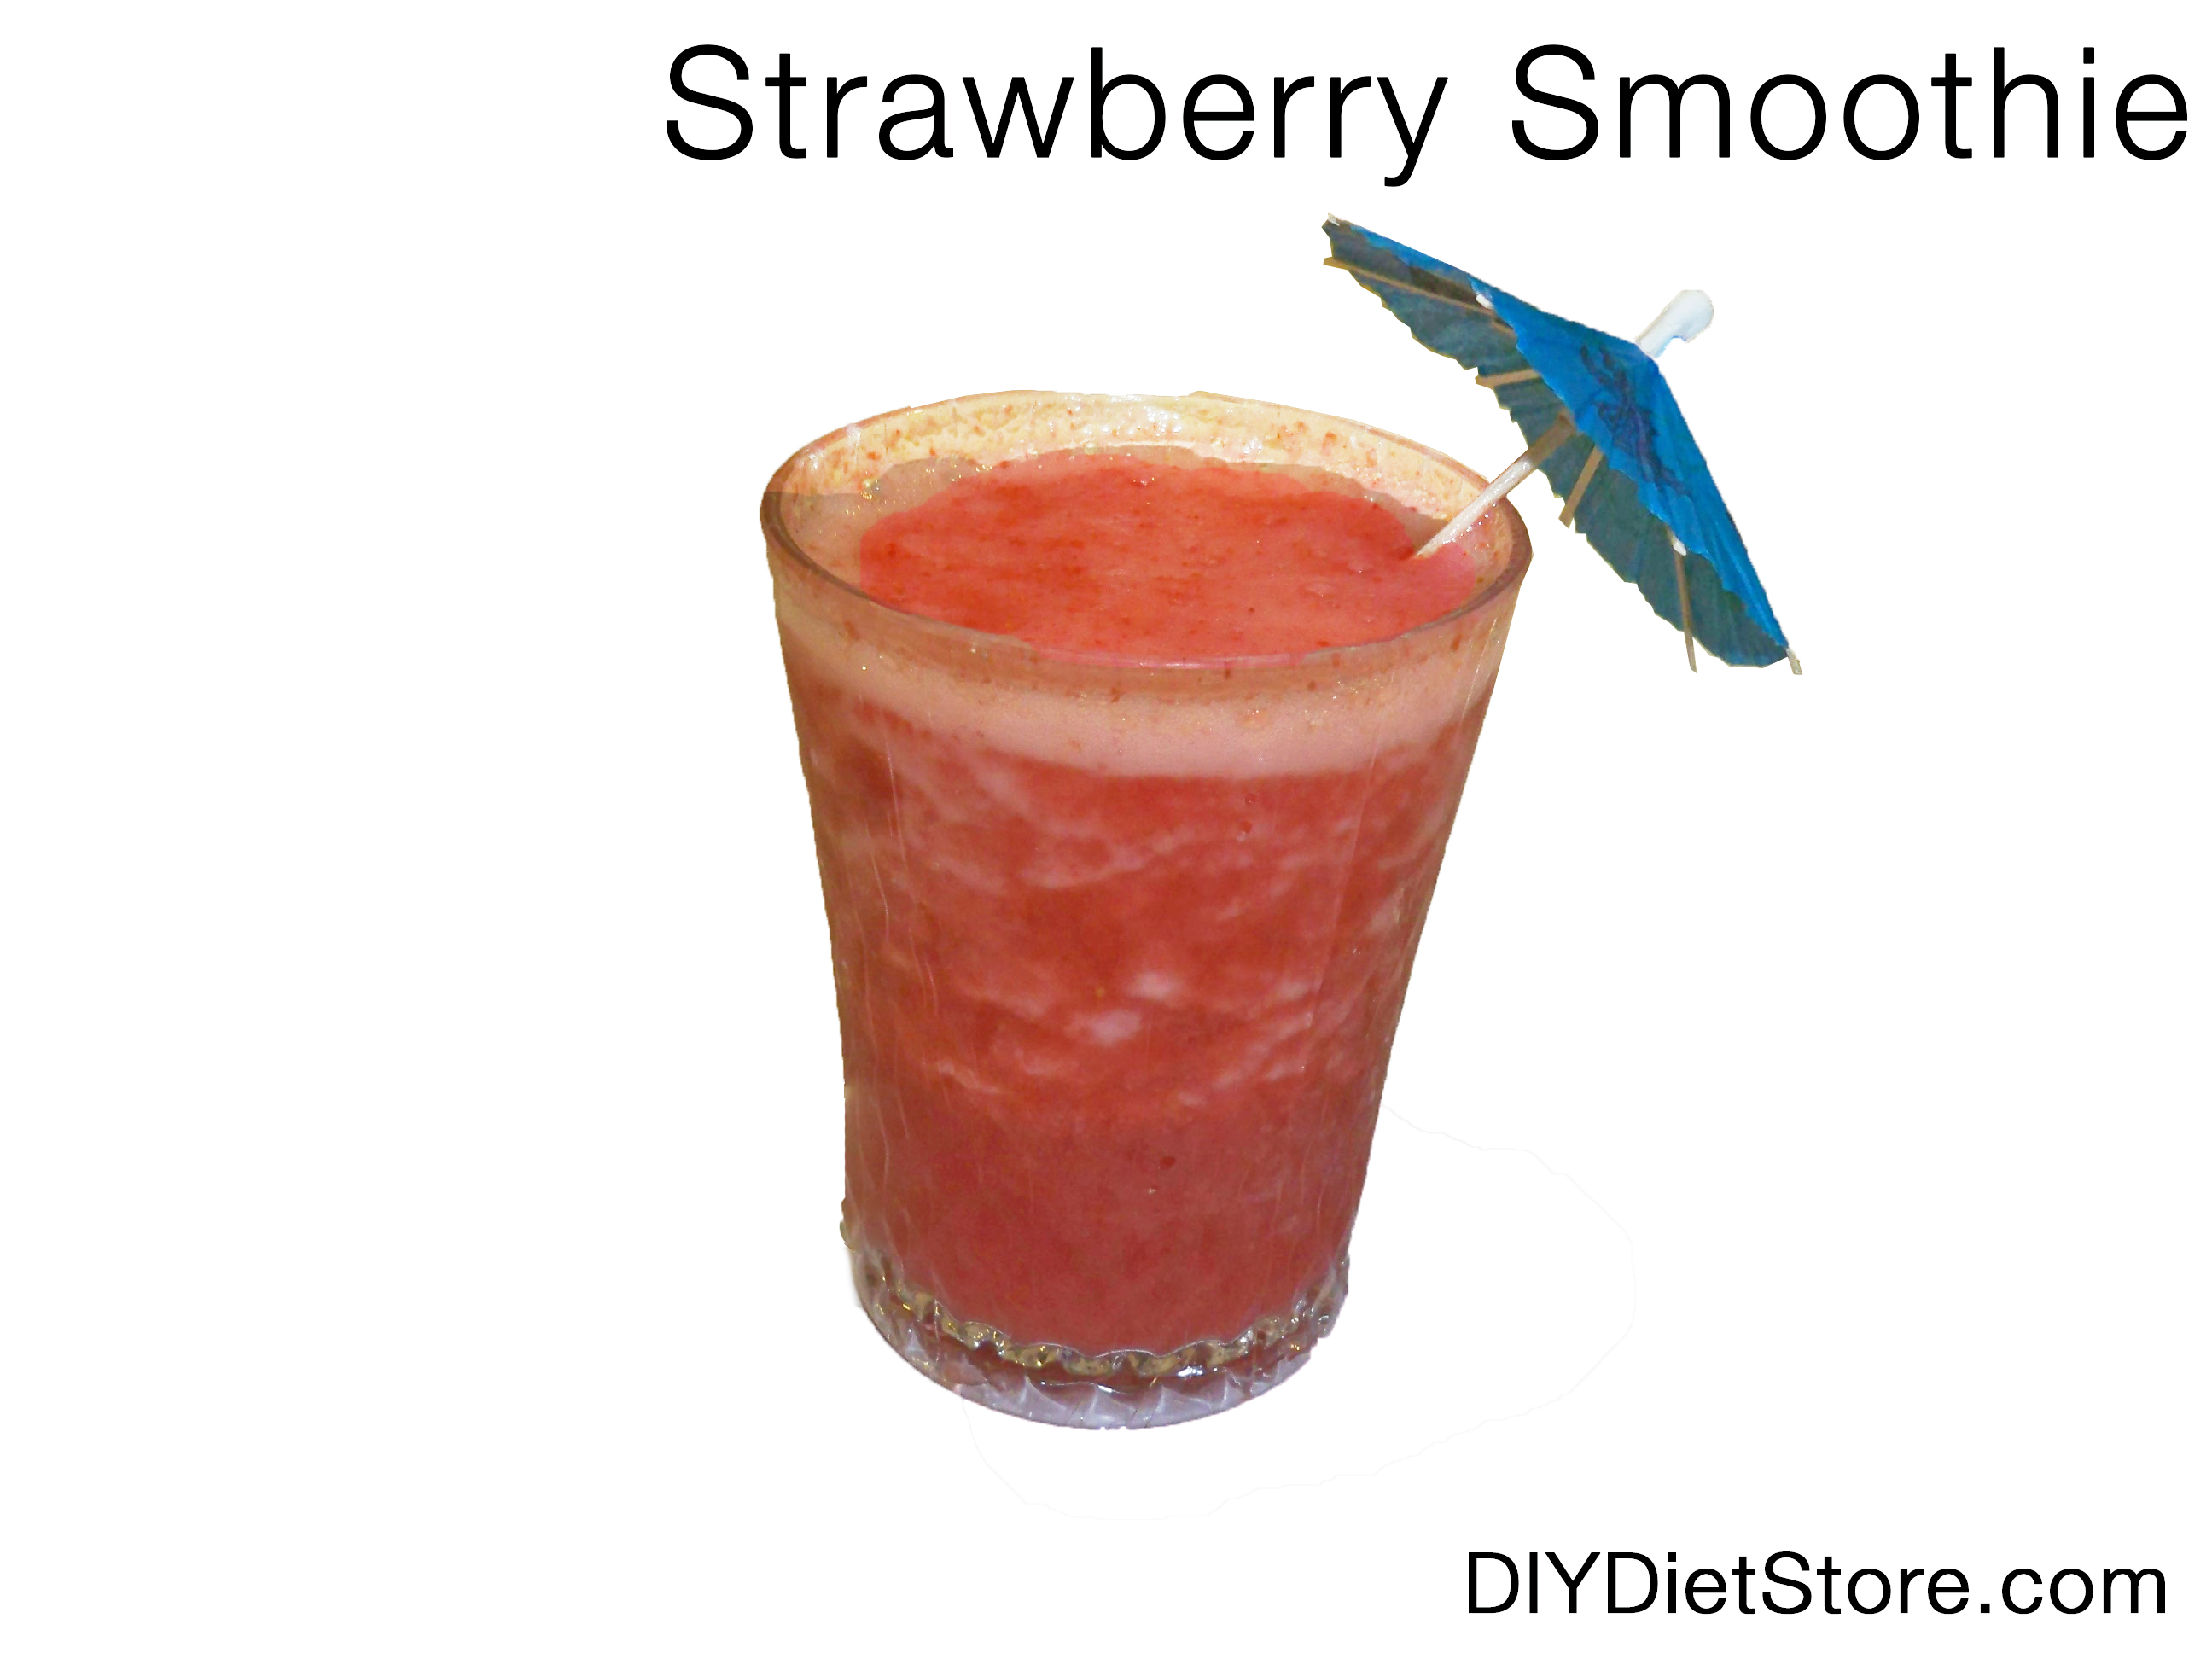 p2-strawberry-smoothie-dds.jpg